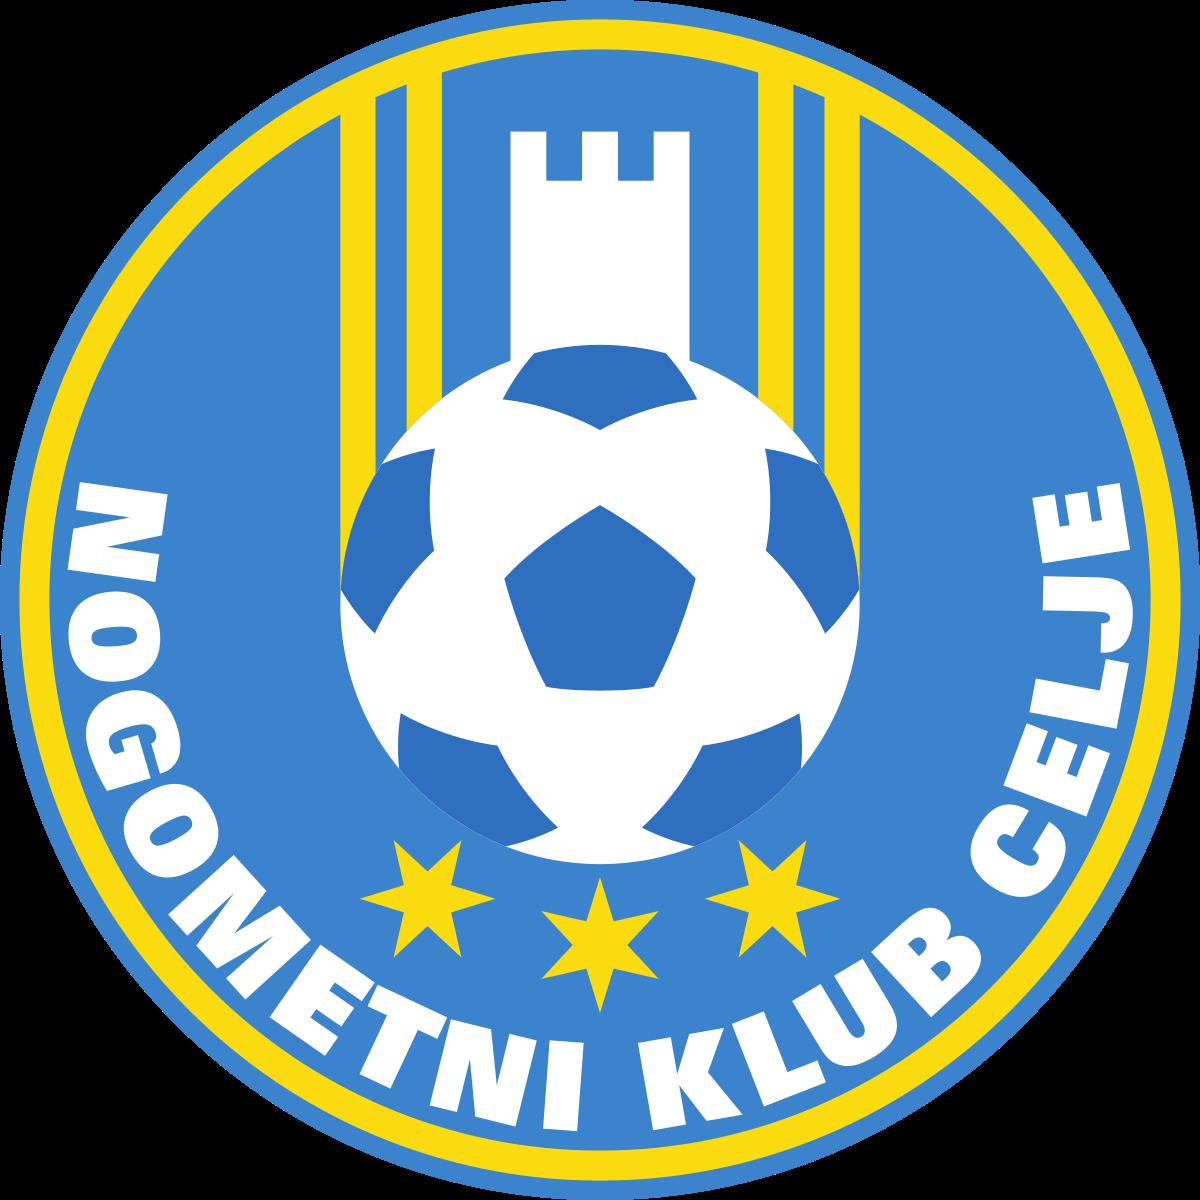 NK CM Celje of Slovenia crest. Celje, Football logo